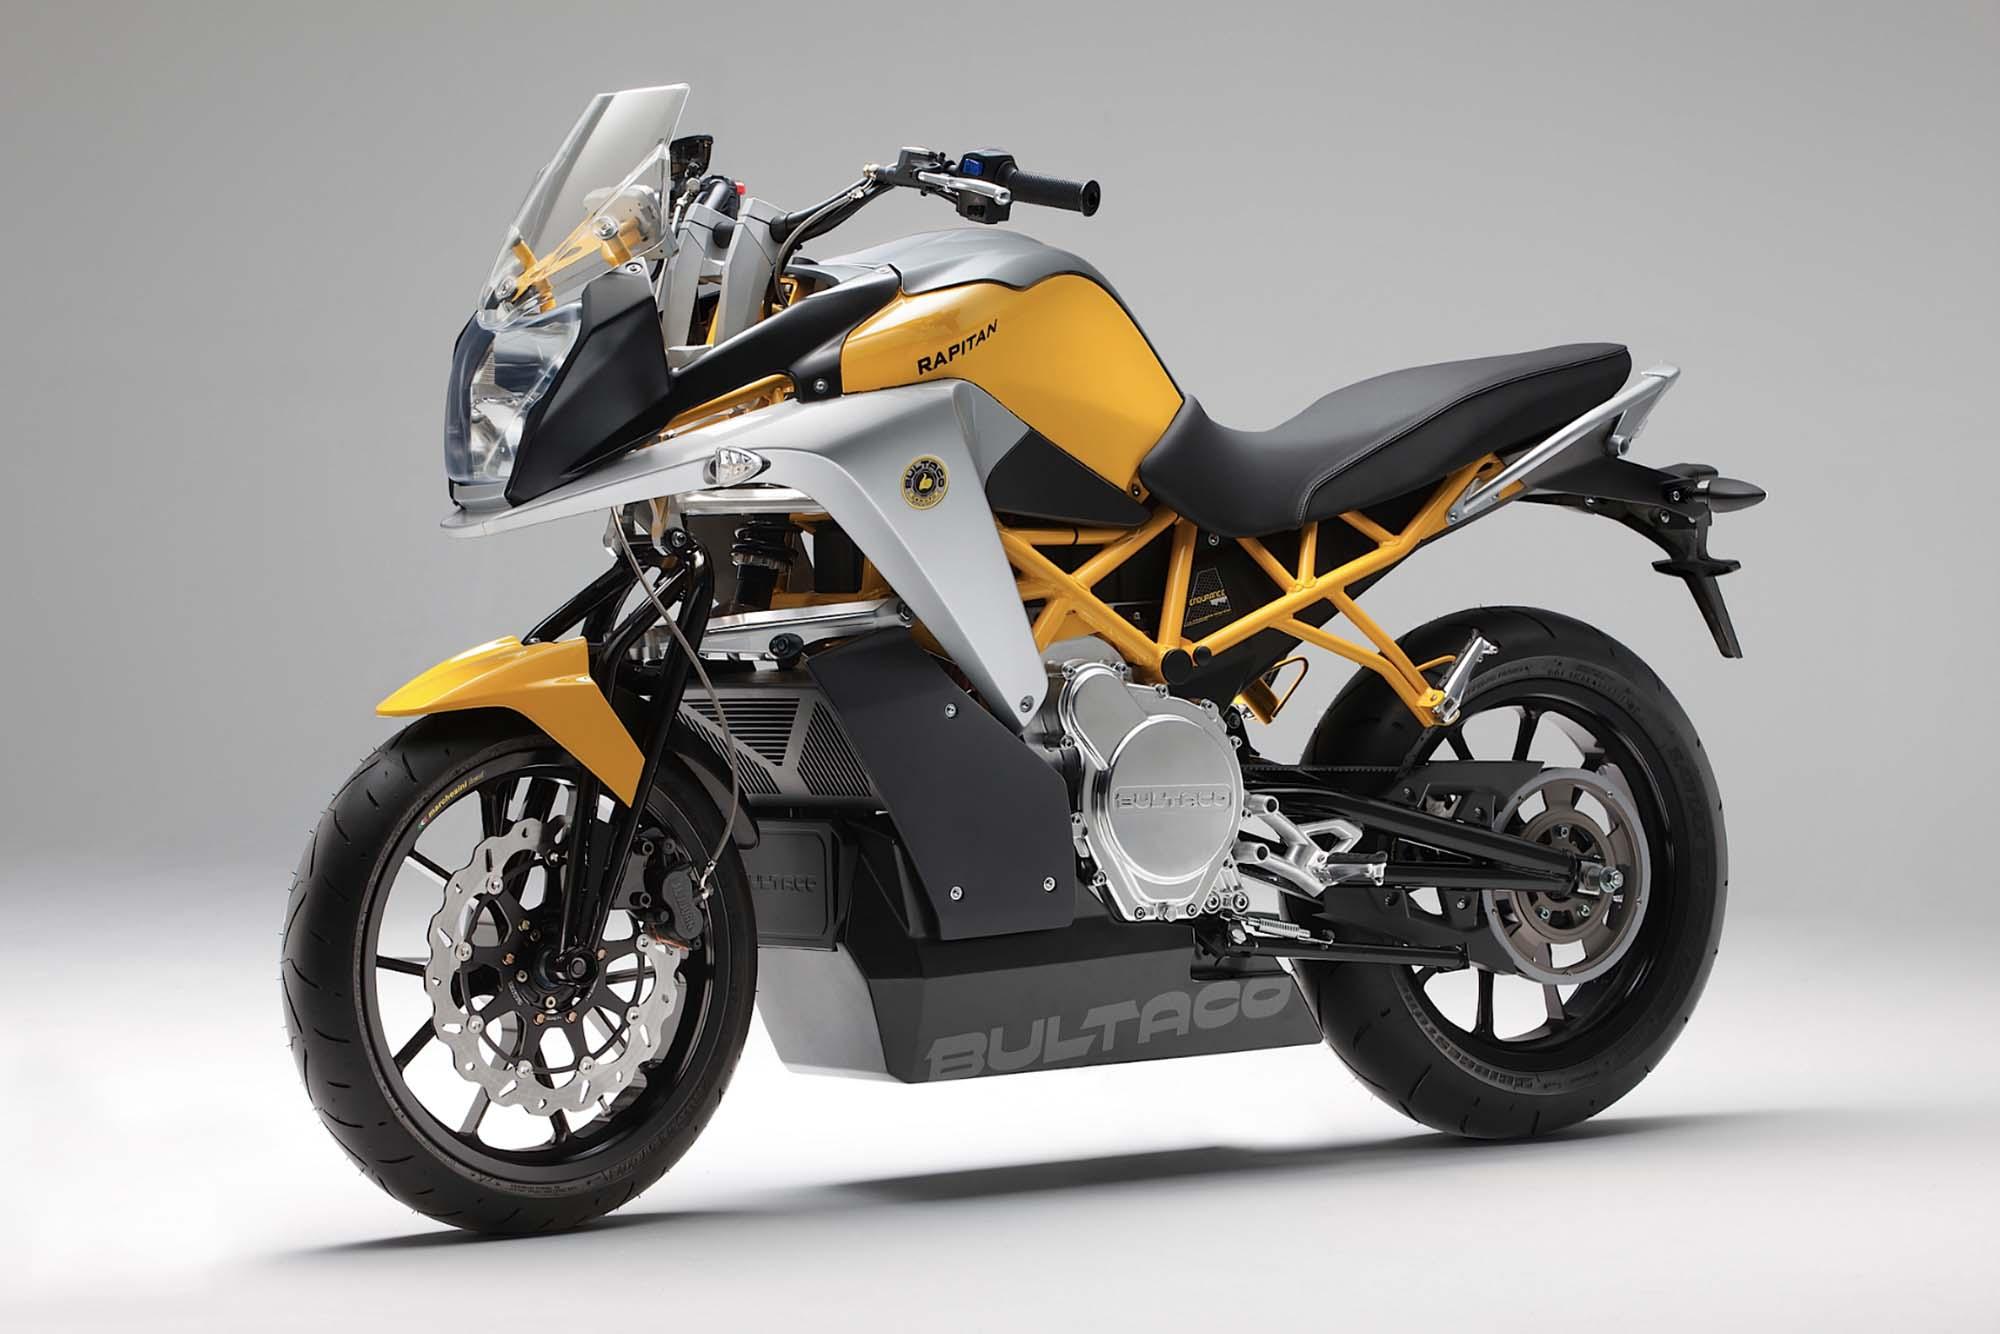 La sportive verte du futur - Page 15 Bultaco-Rapitan-Electric-street-bike-01